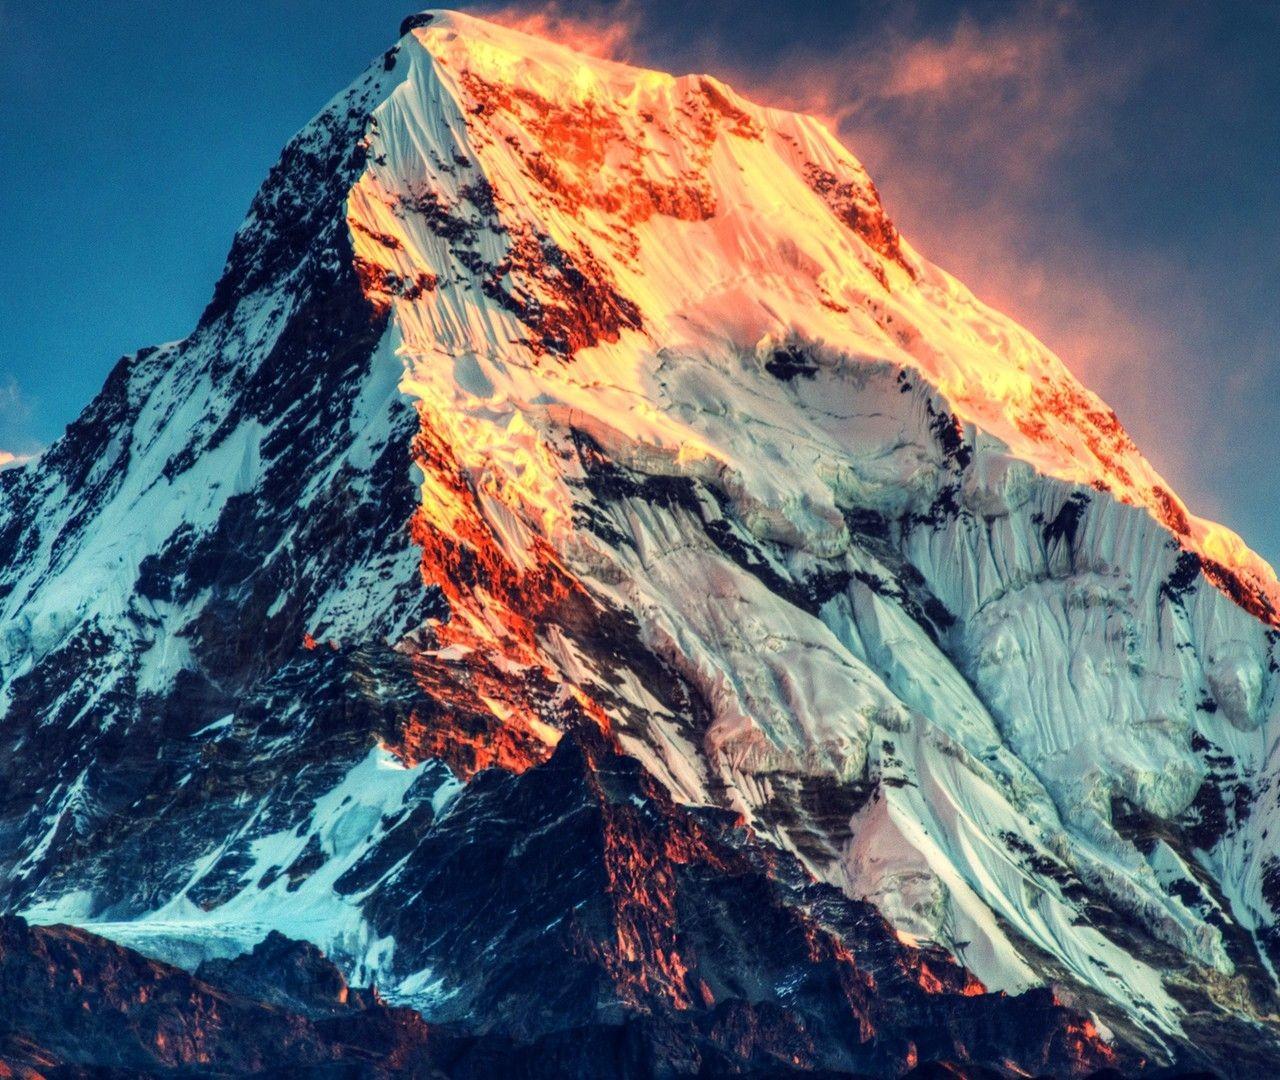 Mount Hd Wallpaper: HD Wallpaper Download